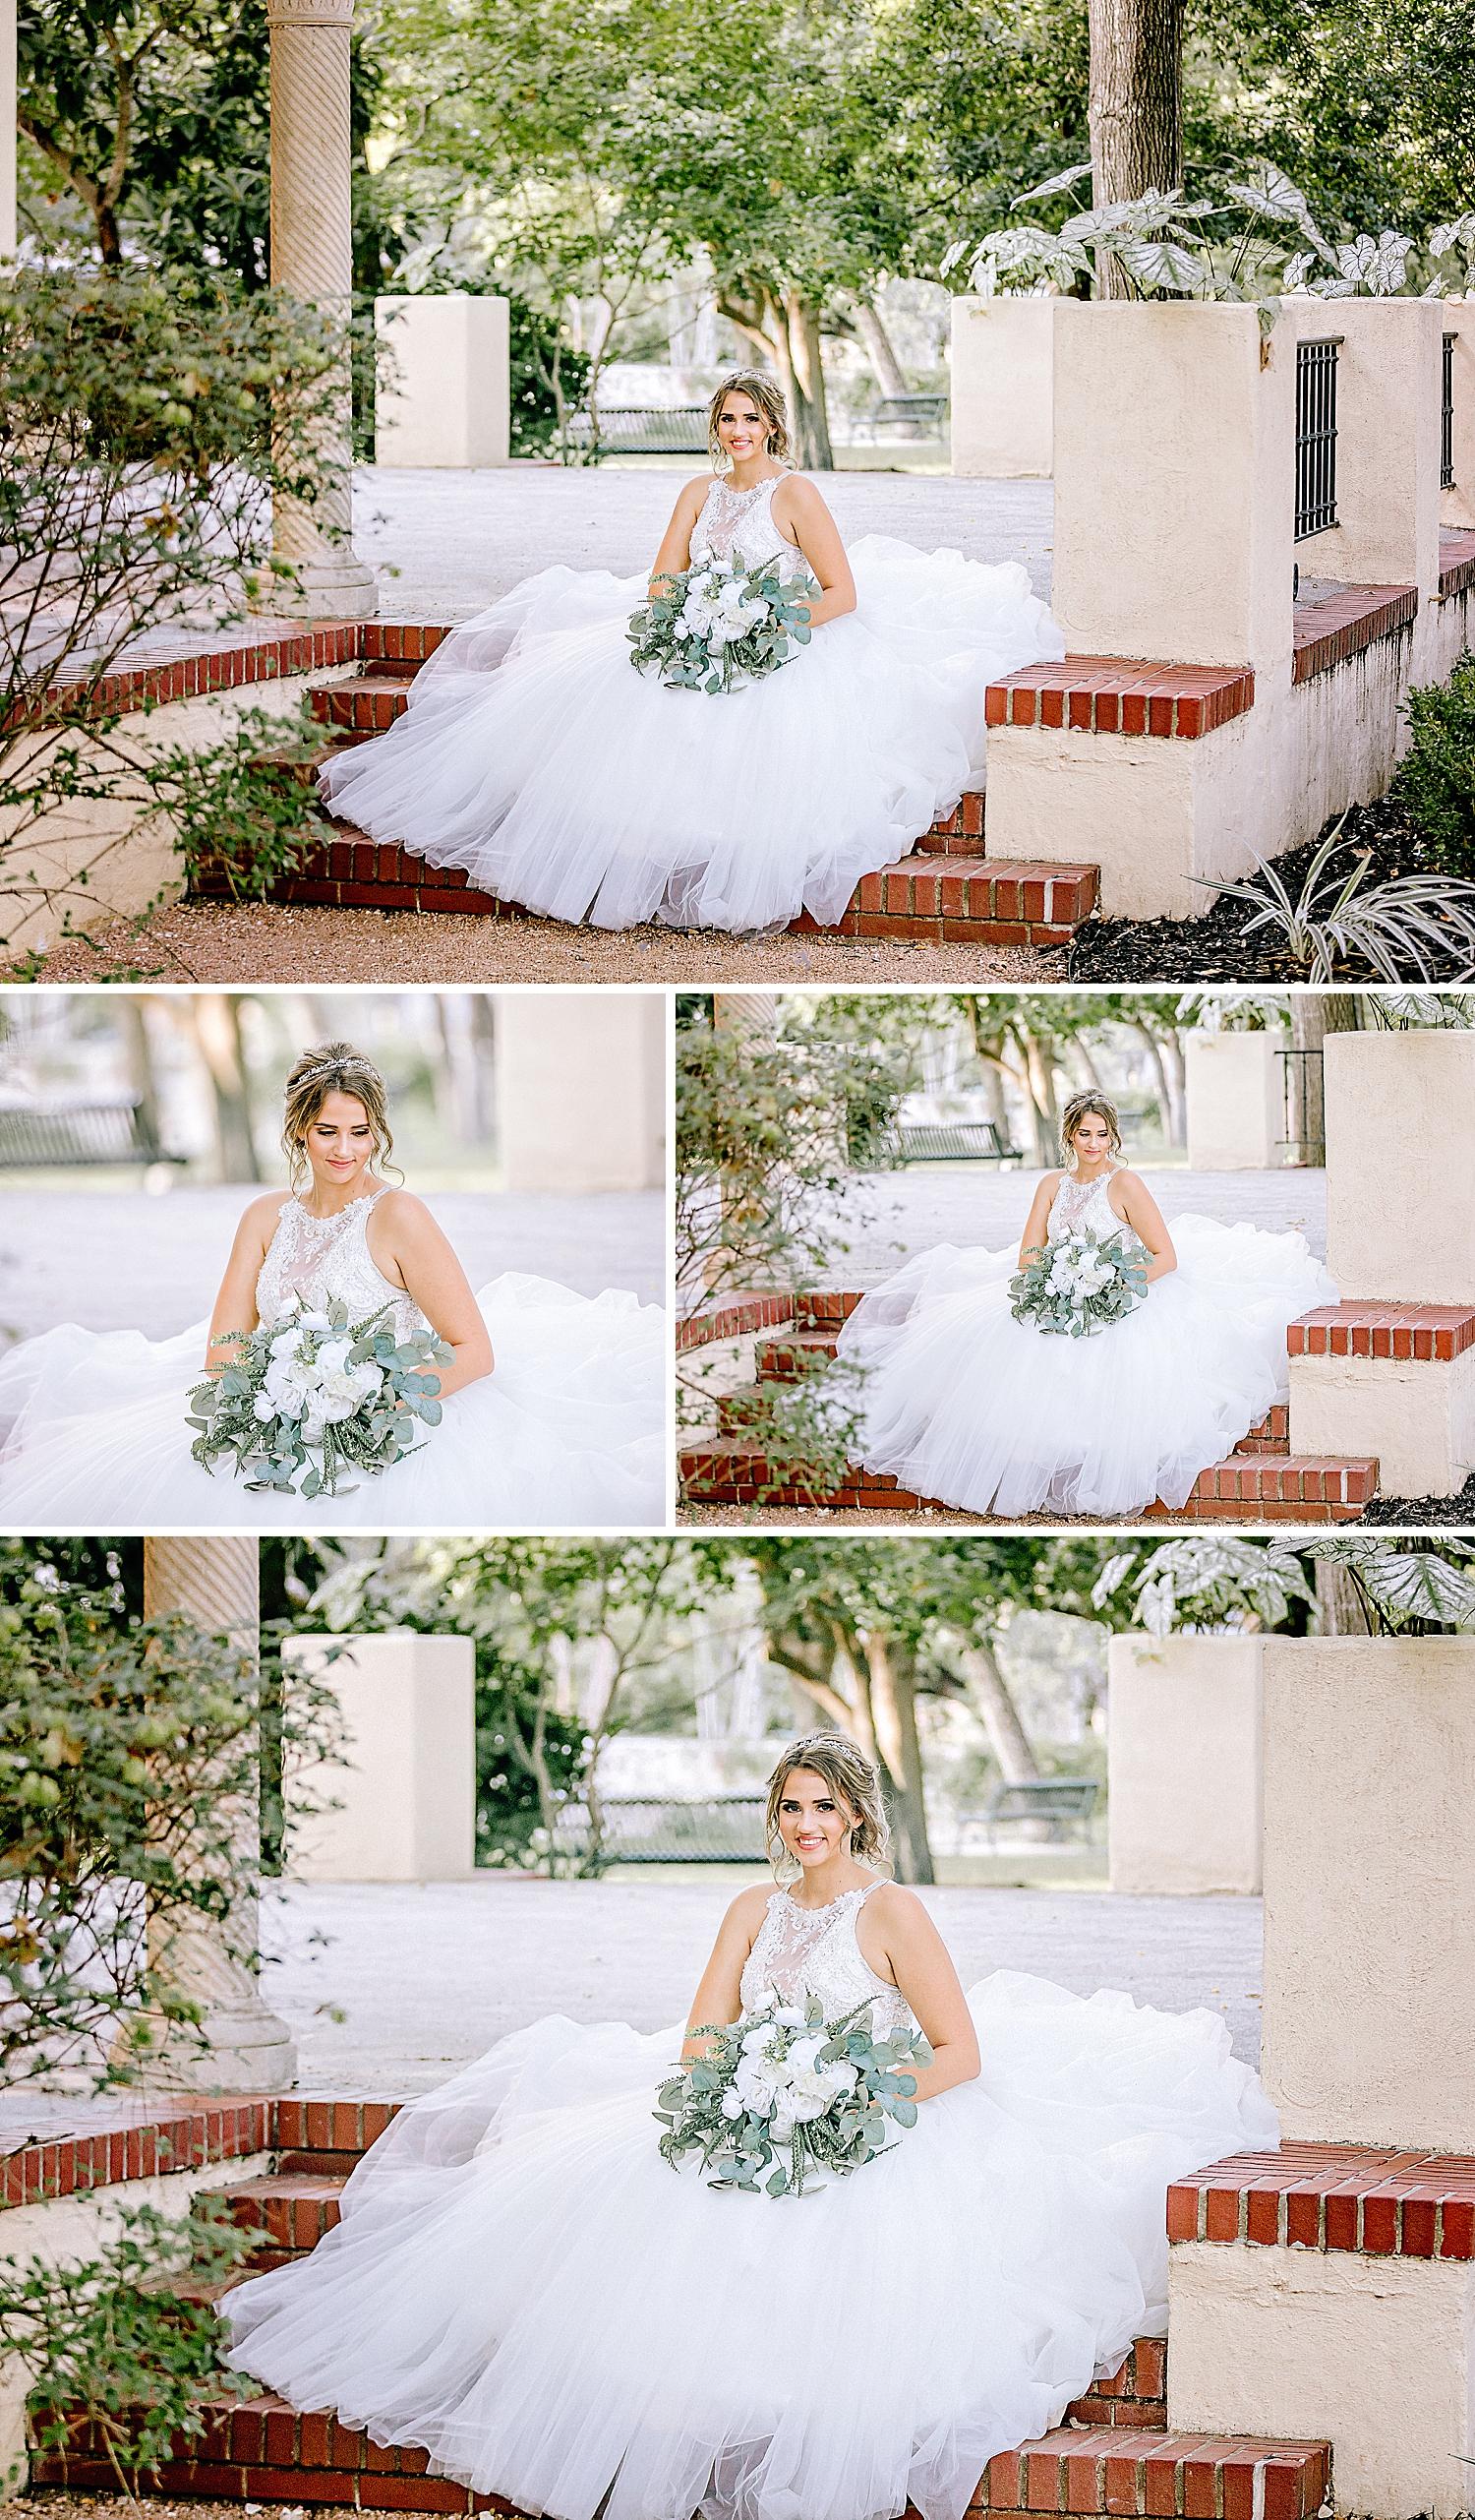 San-Antonio-Weddings-Bridal-Photos-Carly-Barton-Photography_0015.jpg